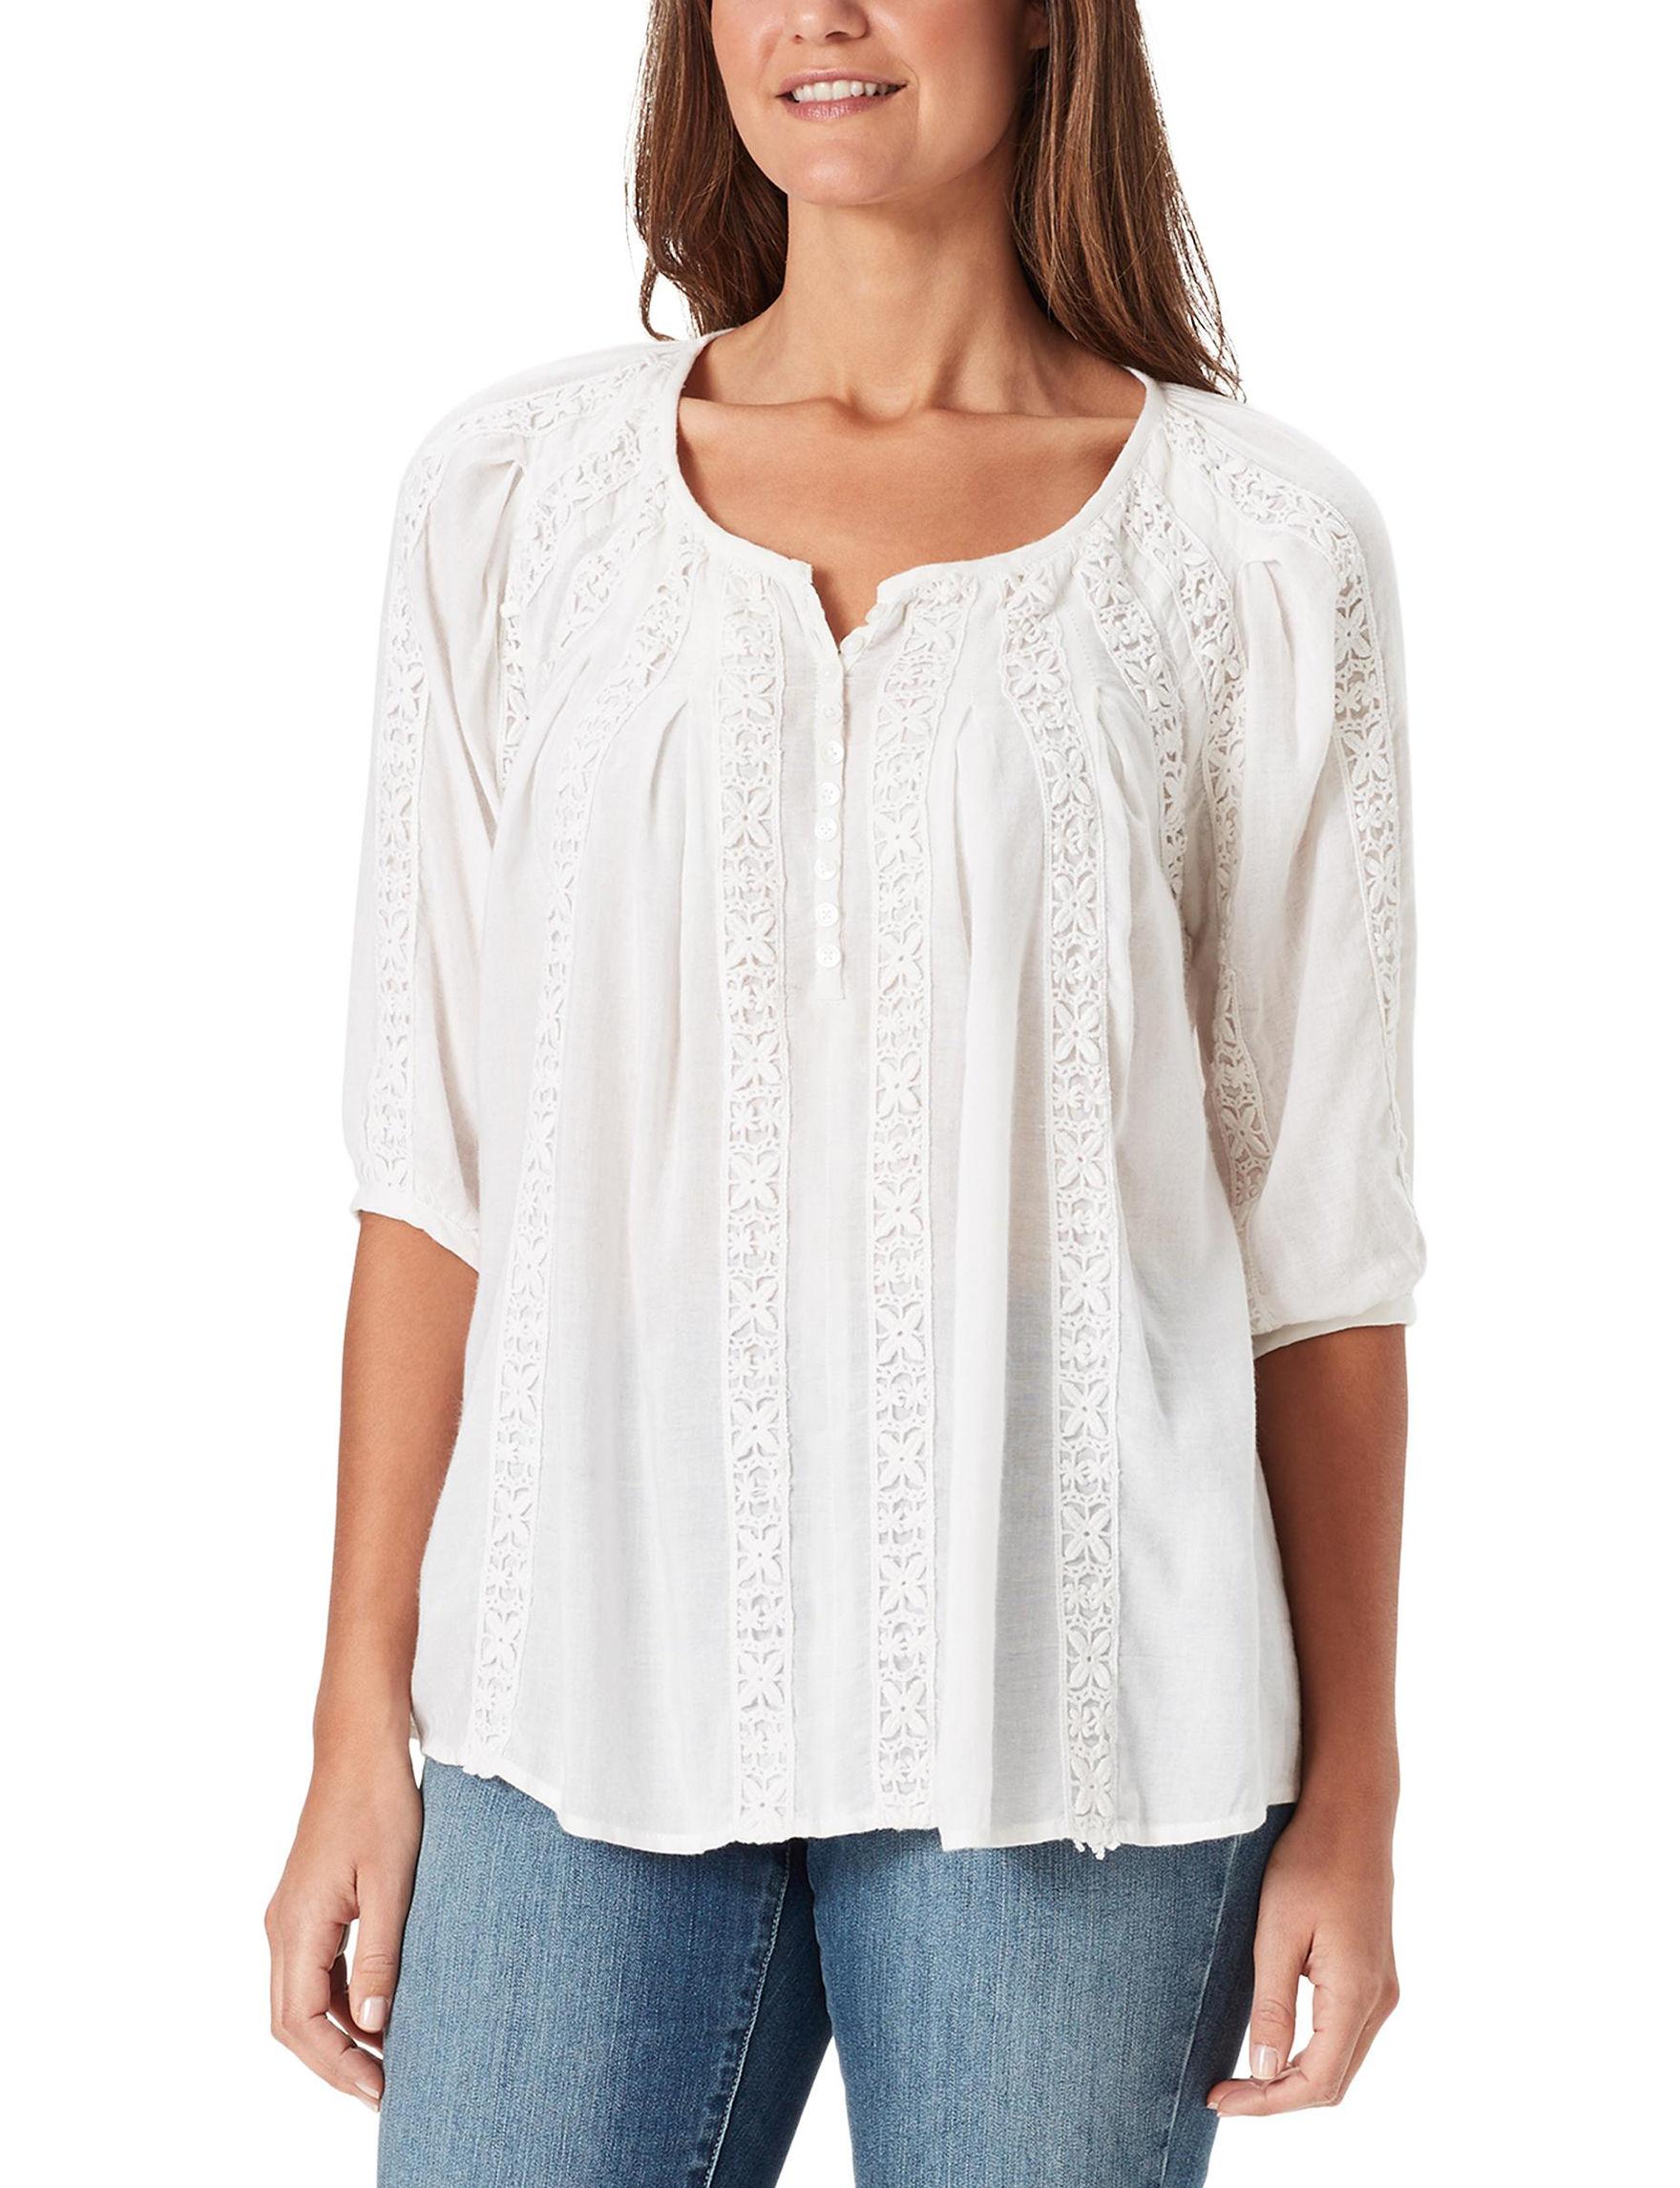 Bandolino White Shirts & Blouses